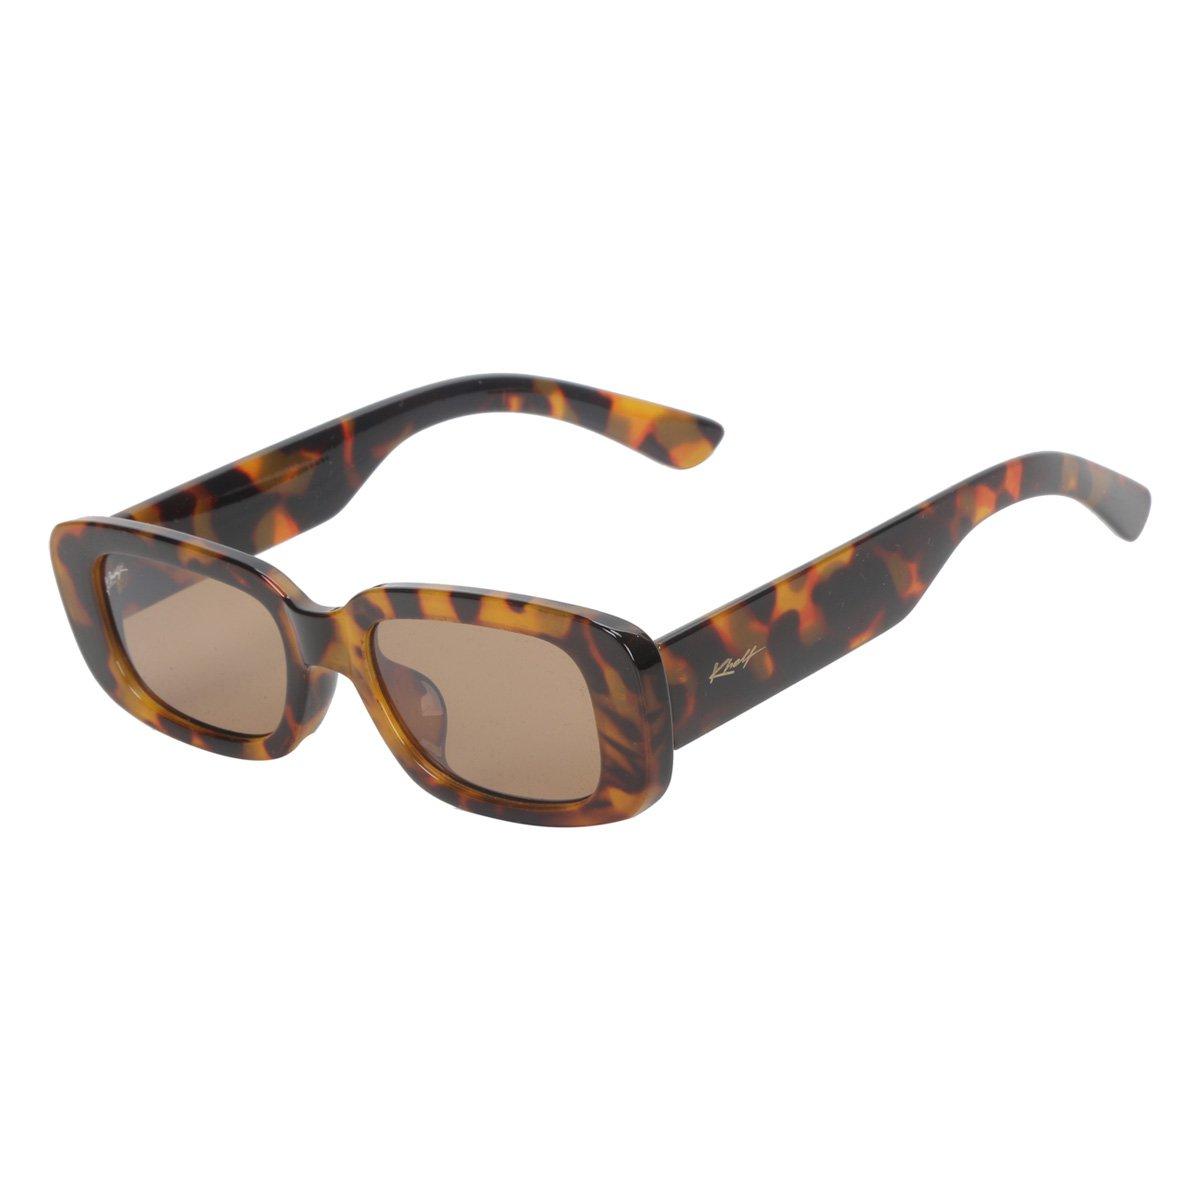 Óculos De Sol Khelf Oval Acetato MG1014 Feminino - Marrom+Preto